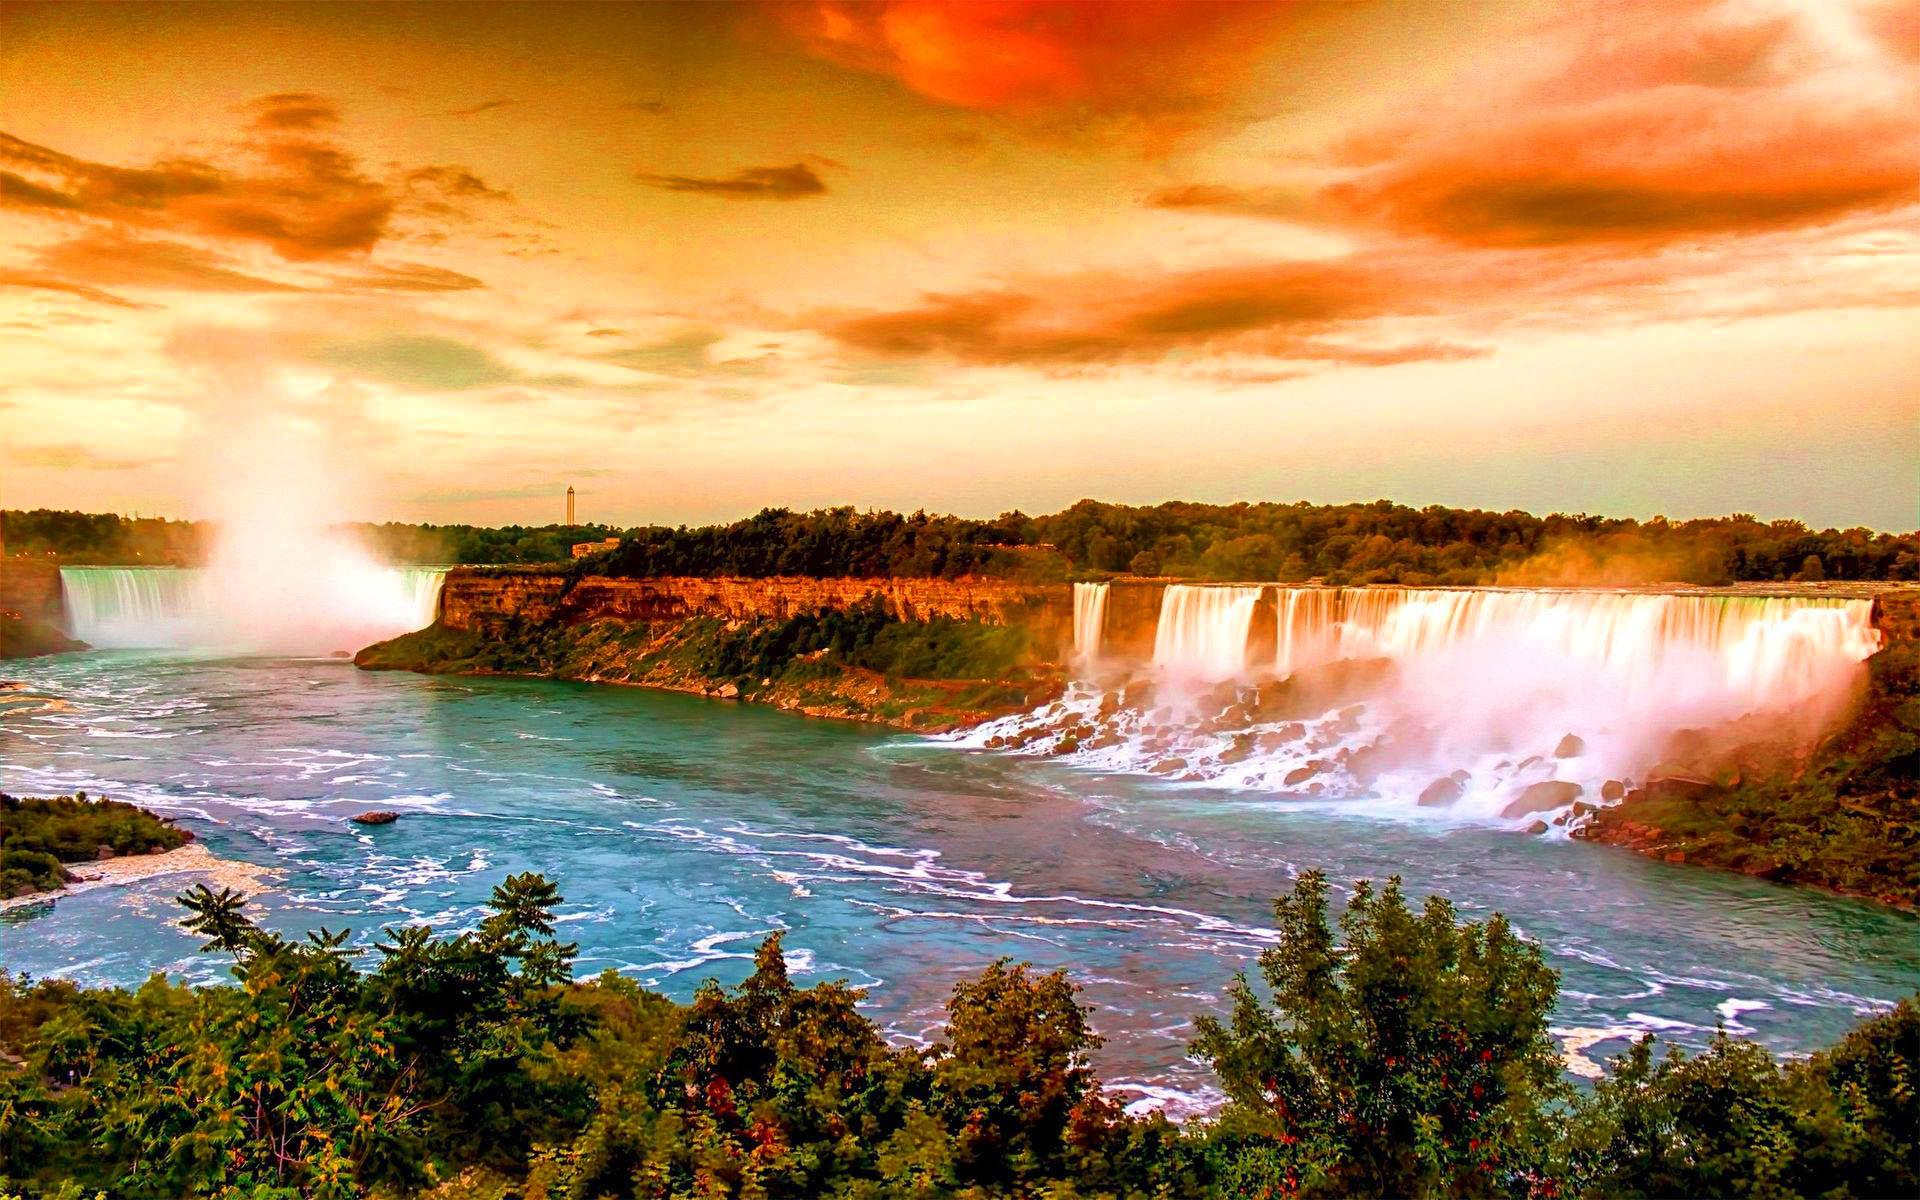 Hd Beautiful Nature Wallpapers Desktop Backgrounds Free